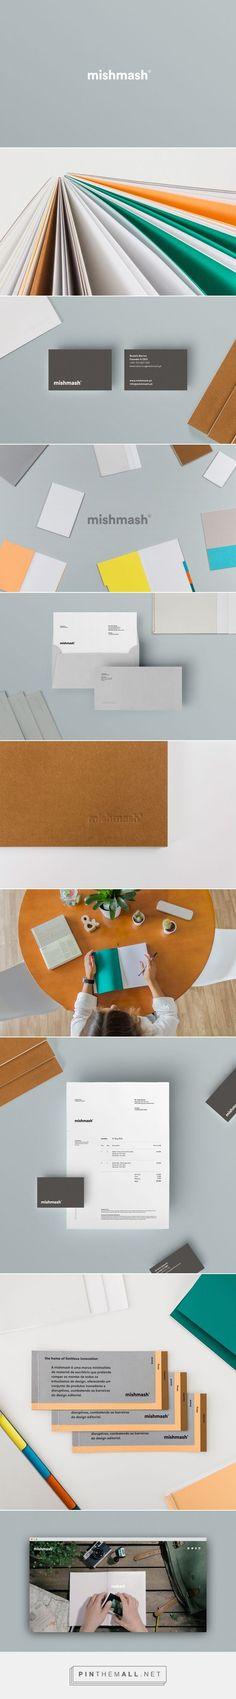 mishmash®️️ on Behance. Visual identity, branding, branding identity, brand design